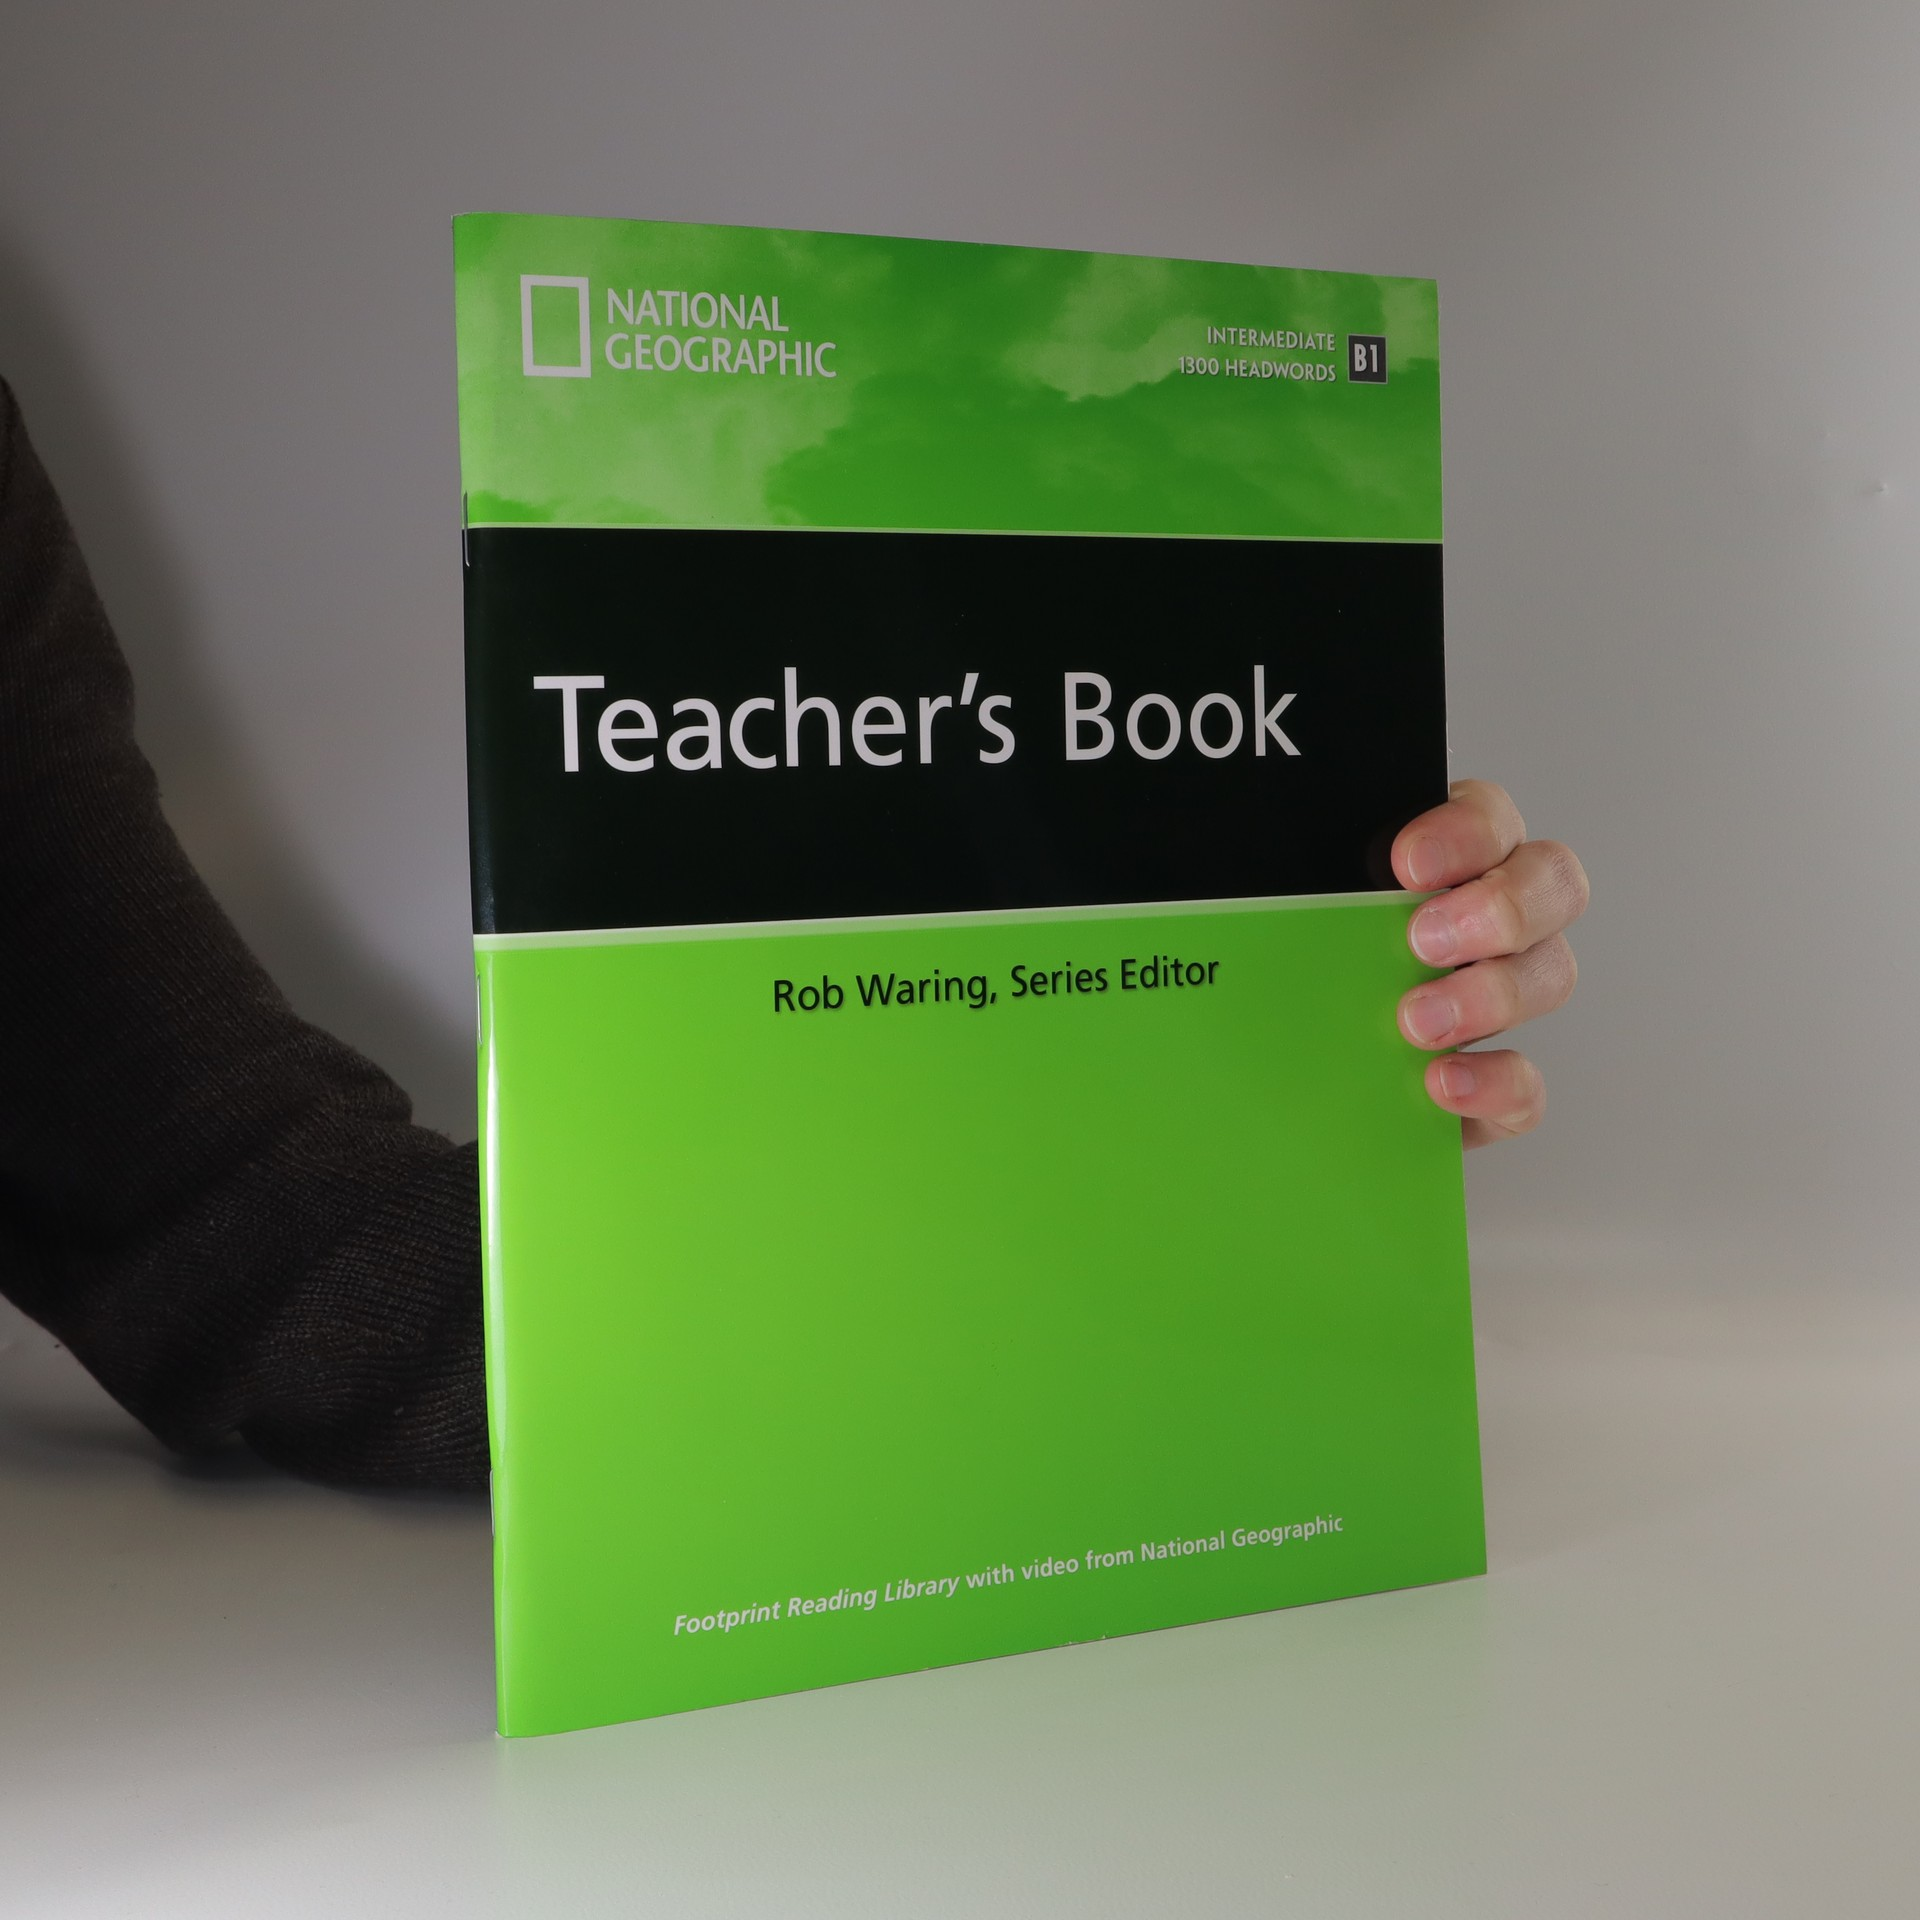 antikvární kniha Footprint Reading Library, Intermediate B1, Teacher's book, neuveden